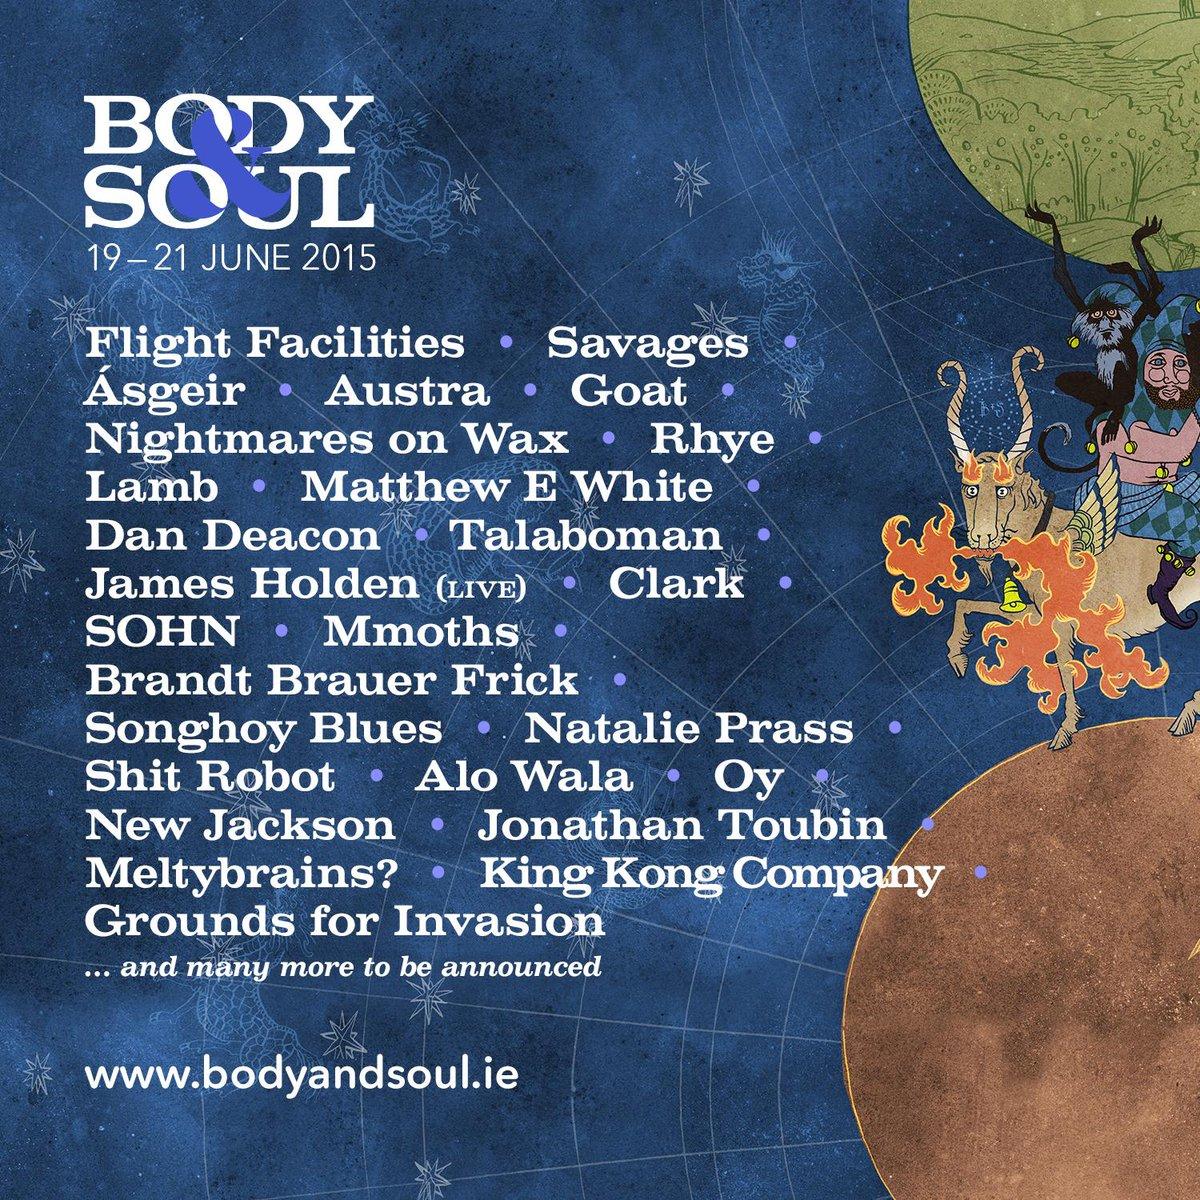 Body&Soul 2015 Lineup. June 19-21.  Tickets: http://t.co/uL1I11zvjn Delve Deeper: http://t.co/Fn4tq57Po7 http://t.co/3iek3UbqrV